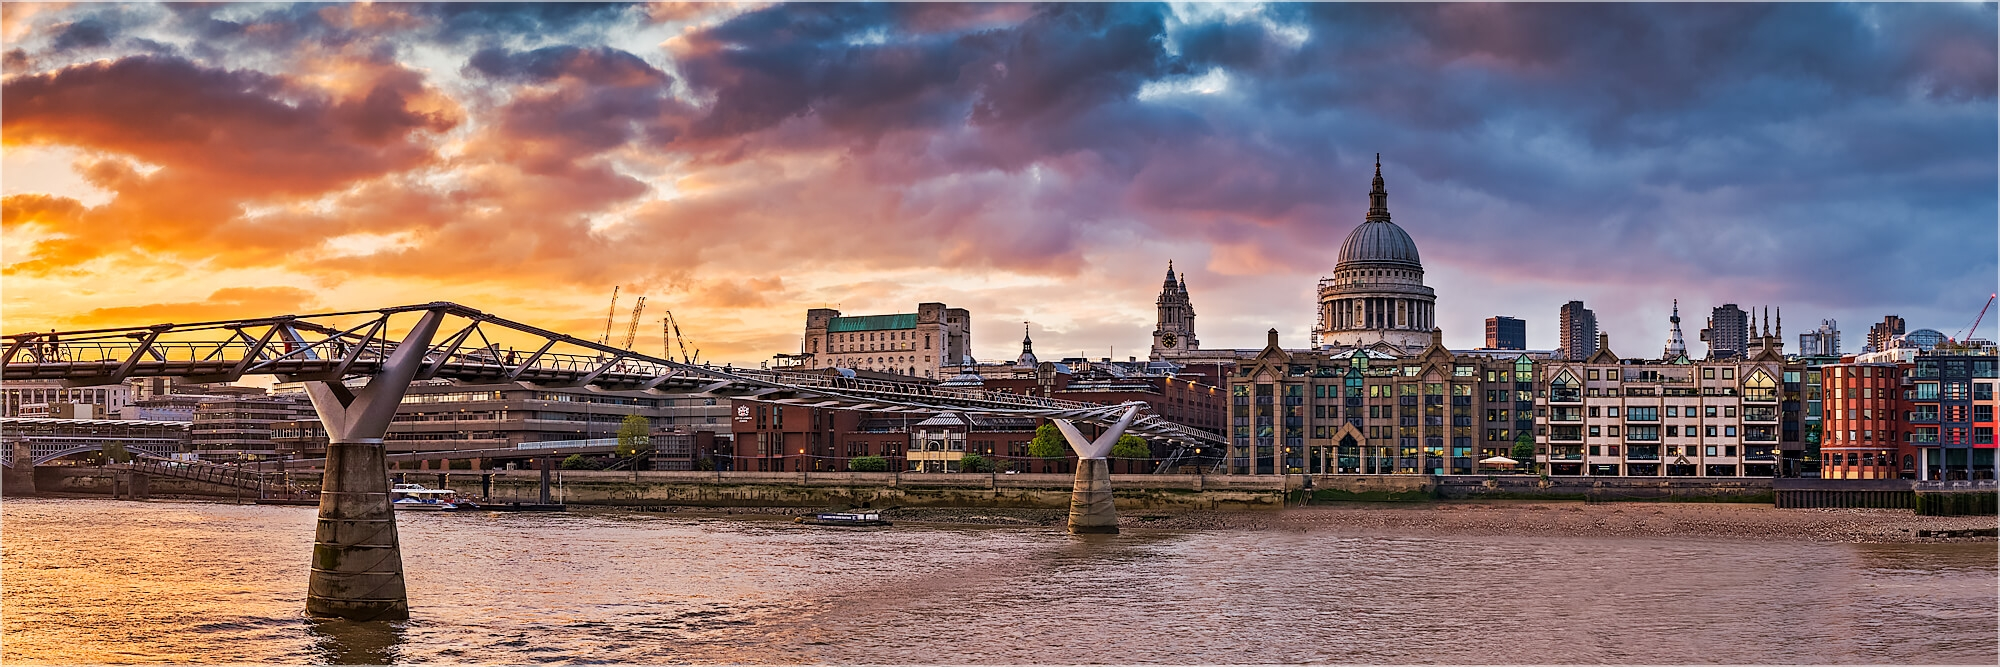 Panoramabild London Millenium Bridge St. Pauls Cathedral